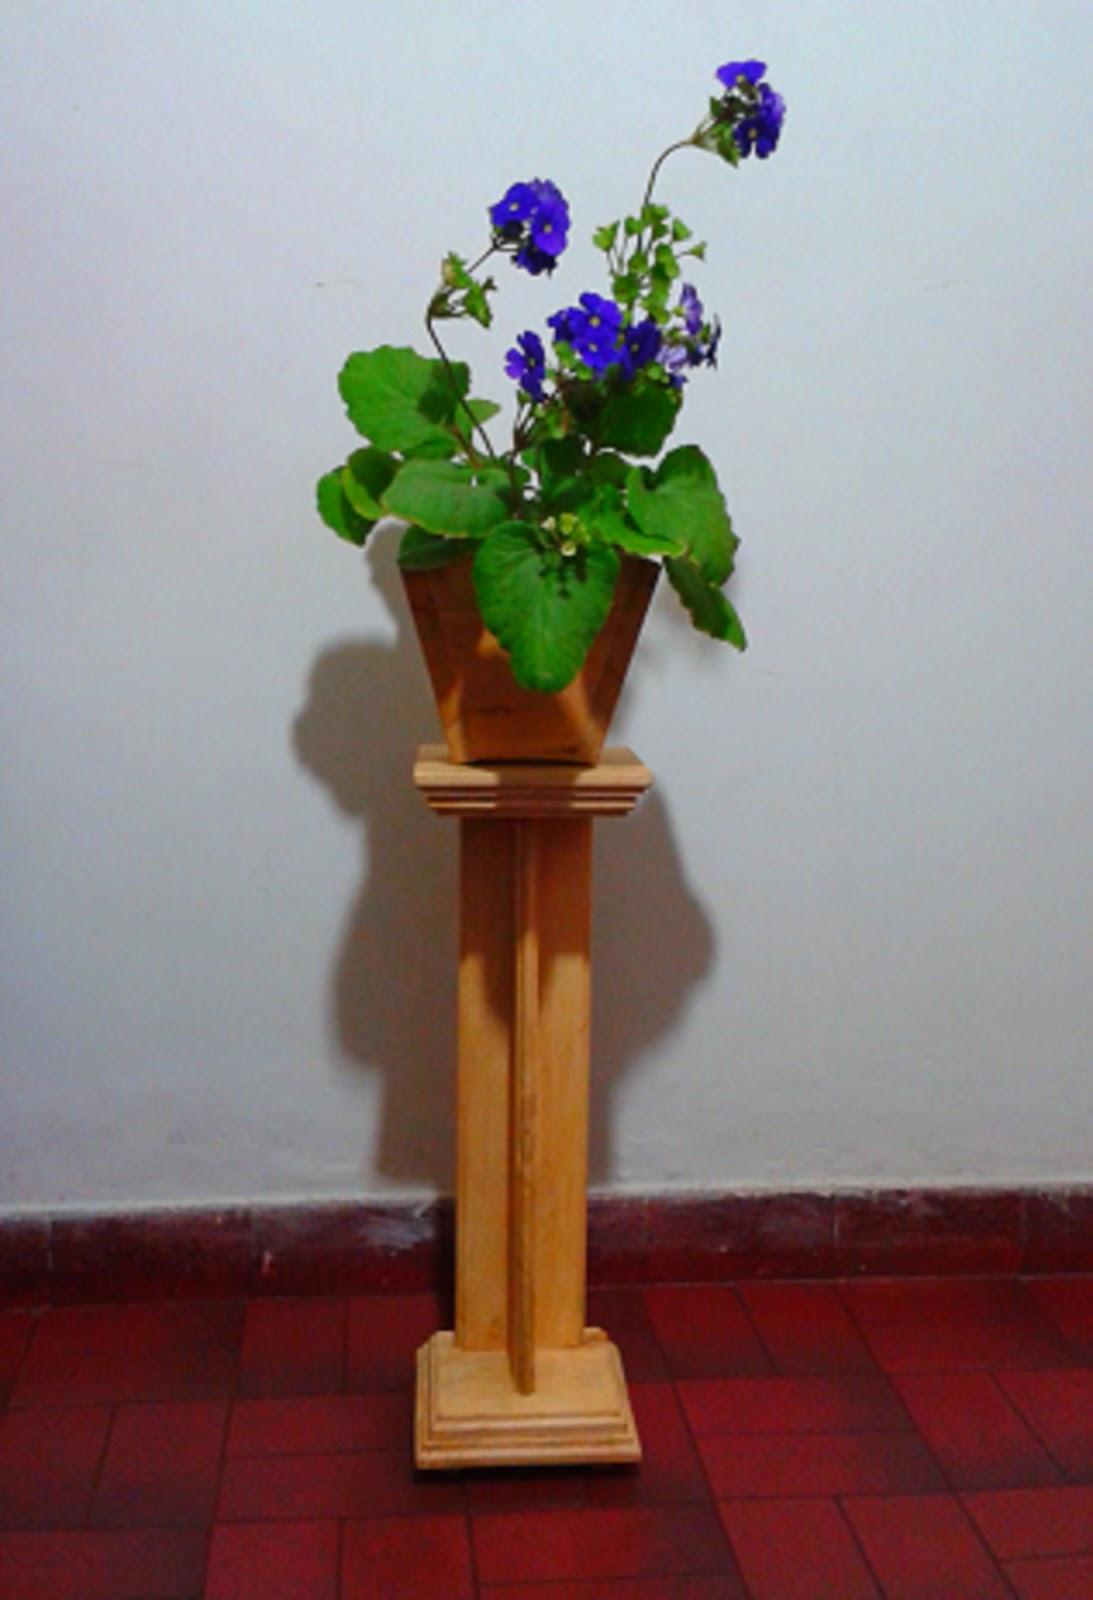 Artesanias casa verde matera mas pedestal en madera - Pedestal para plantas ...